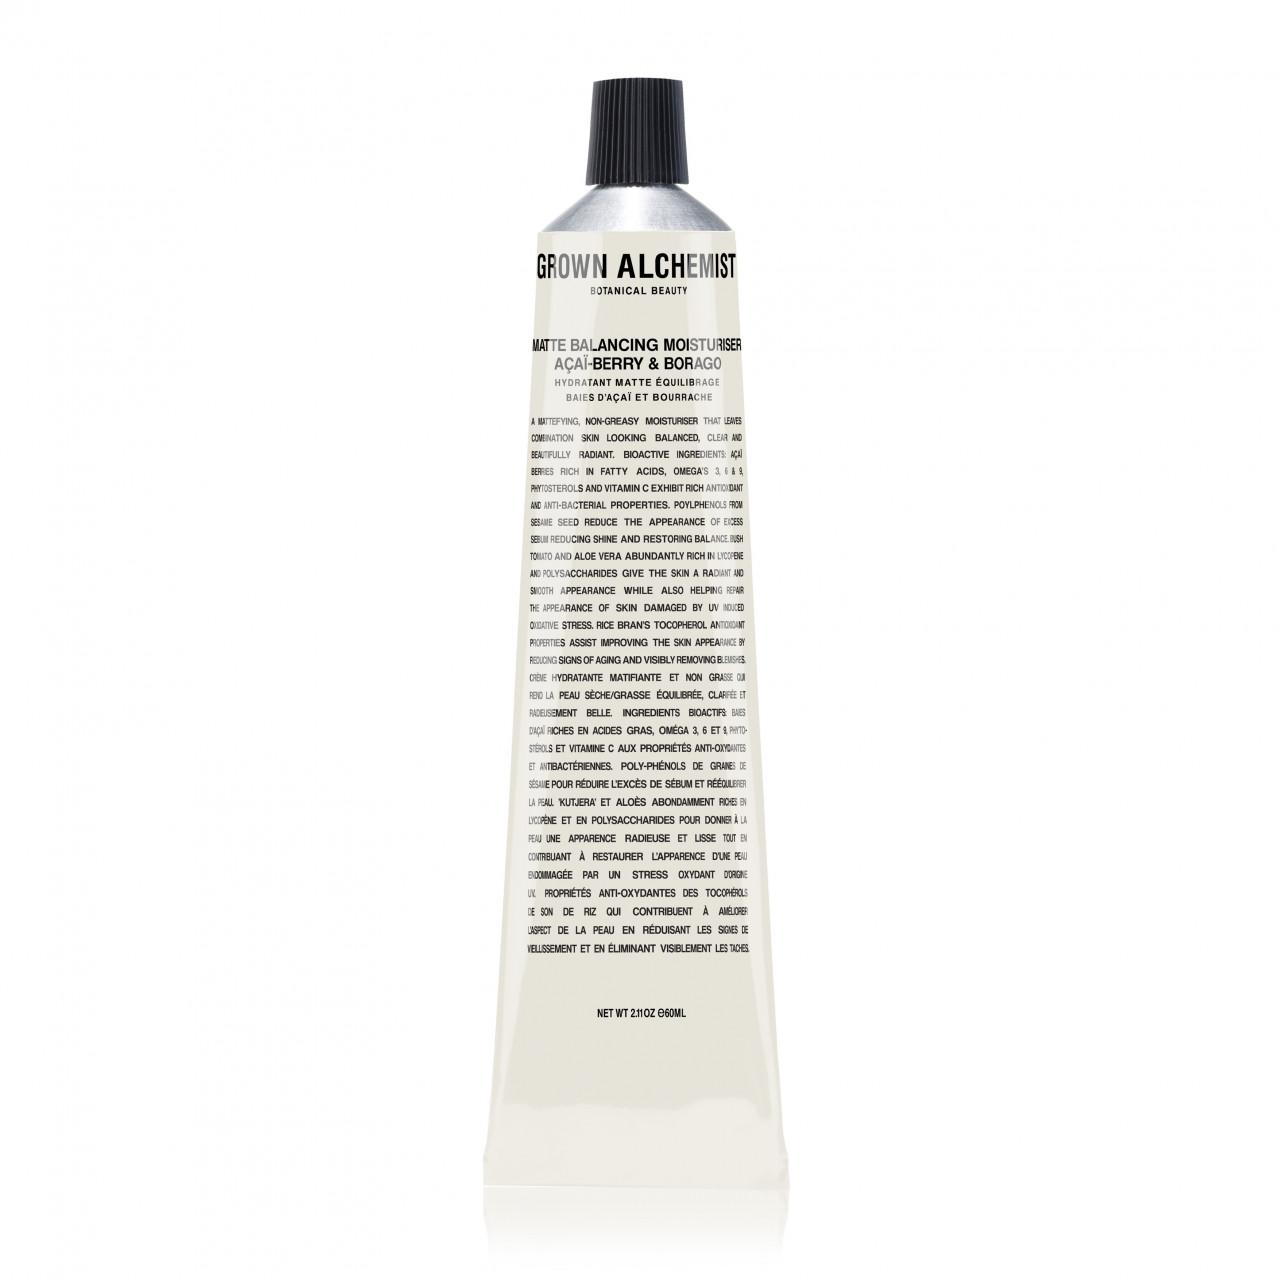 grown-alchemist-facial-moisturiser-matte-balancing-acai-berry-borage-gesichtscreme